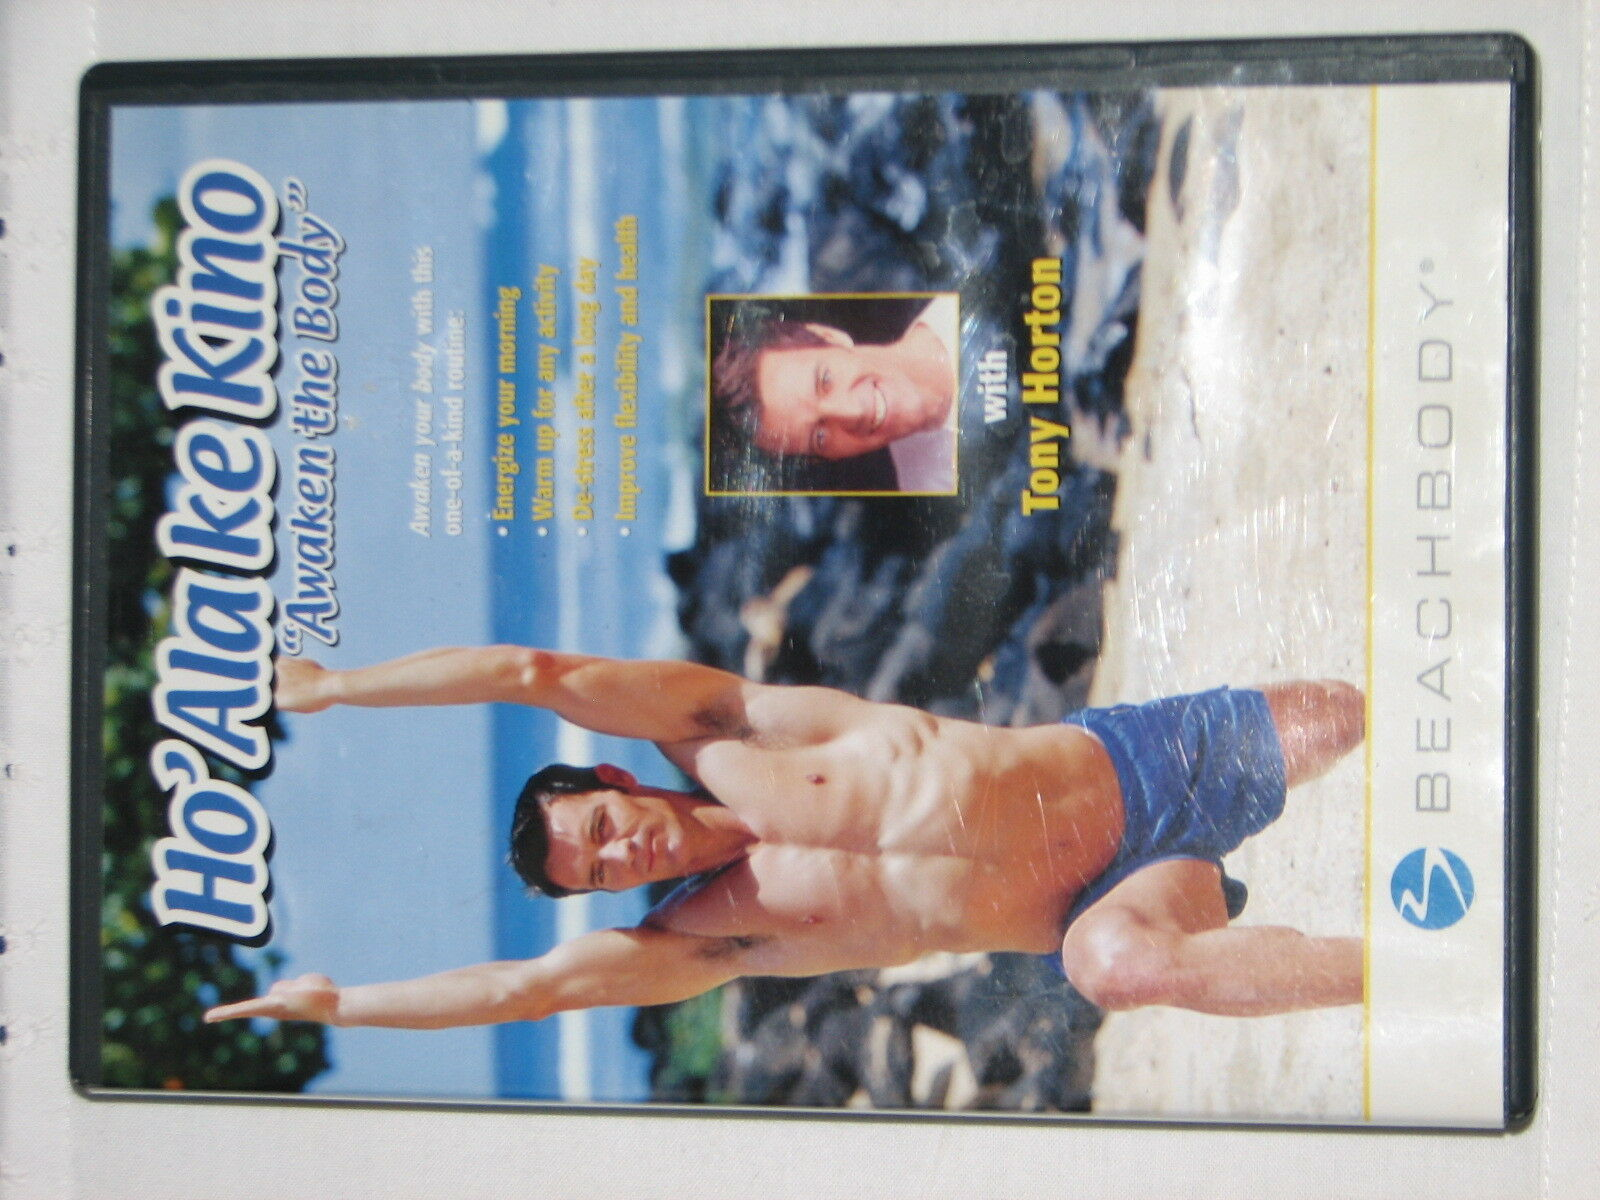 Two Tony Horton DVD's POWER 90 FAT BURNING SYSTEM HO'ALAKE KINO AWAKEN THE BODY image 5